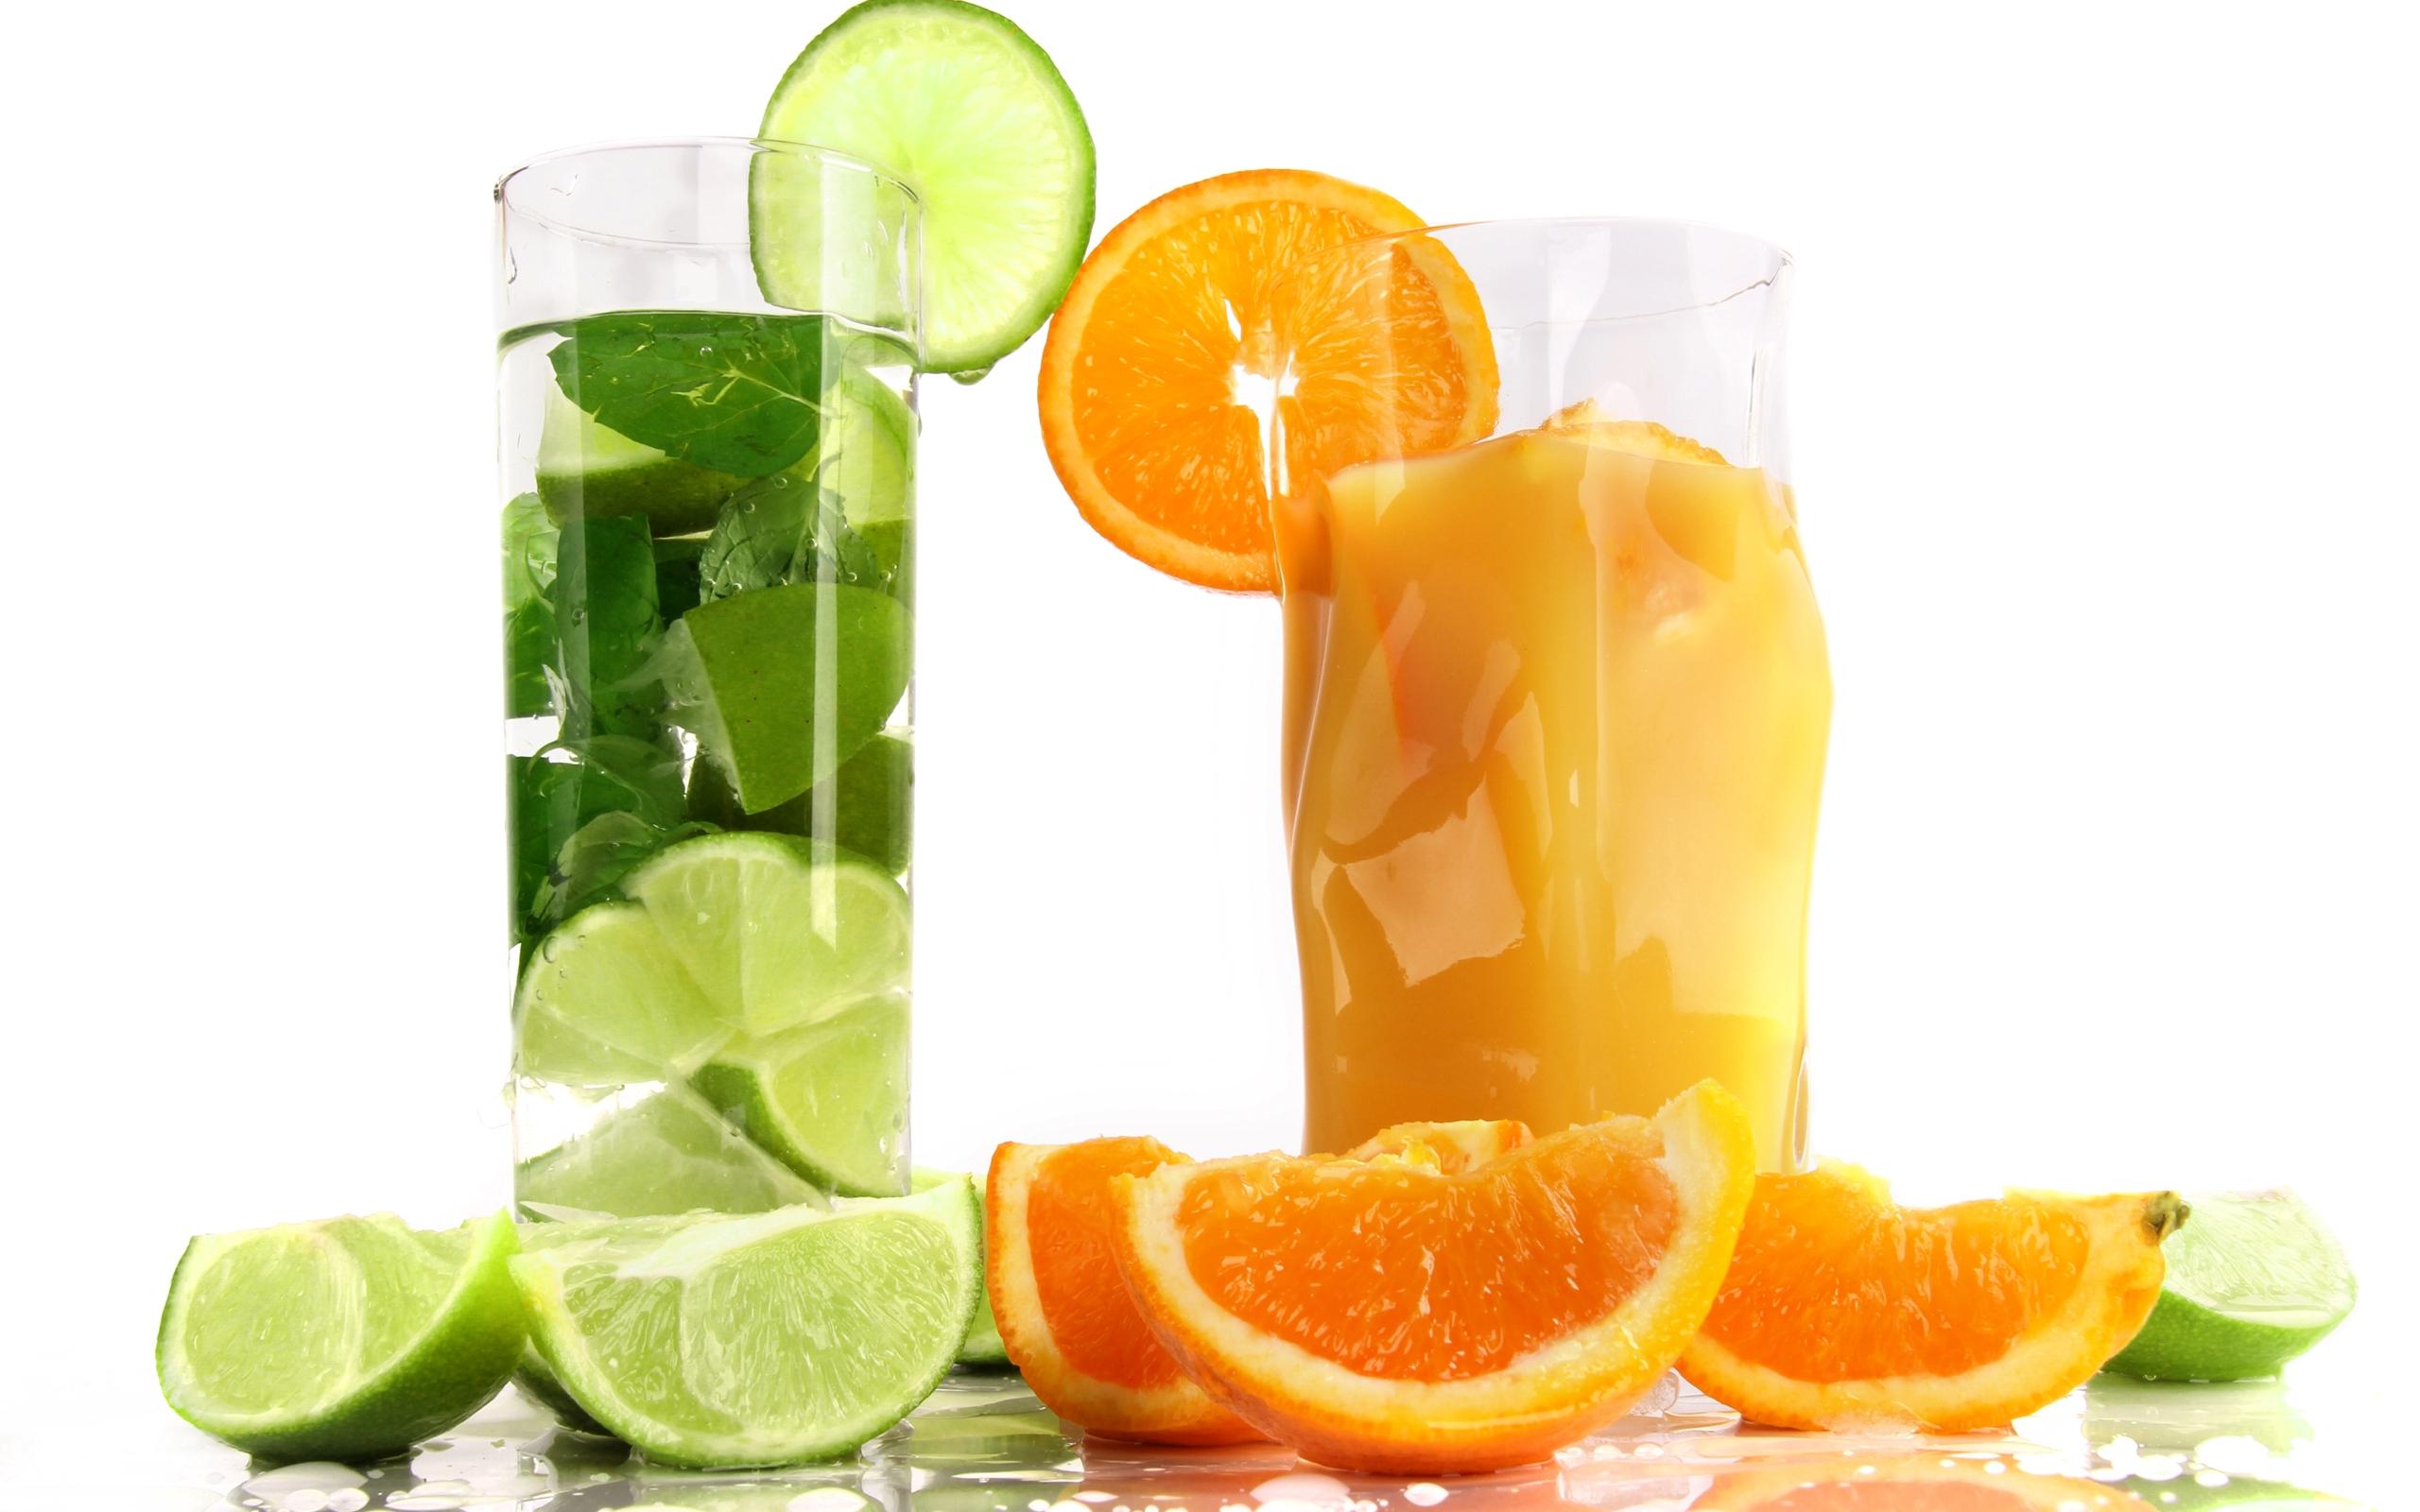 Fresh Fruit Juice Wallpaper Photos 1418 Wallpaper WallpapersTube 2560x1600